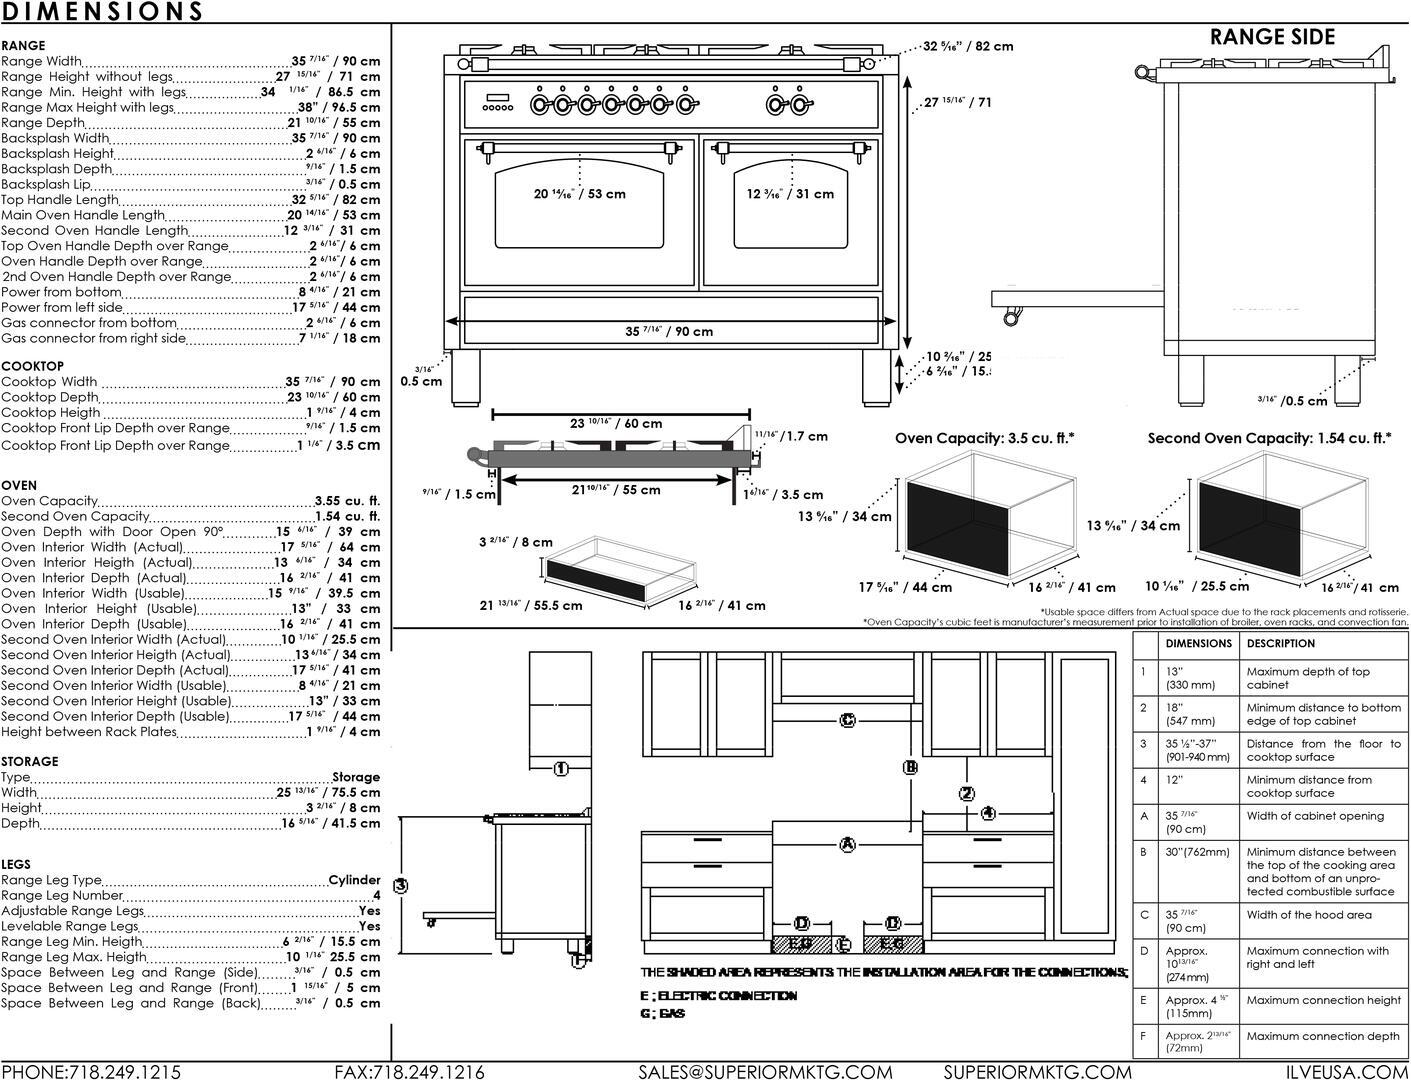 Ilve Professional Plus UPDW90FDMPM Freestanding Dual Fuel Range Gray, Dimensions Guide